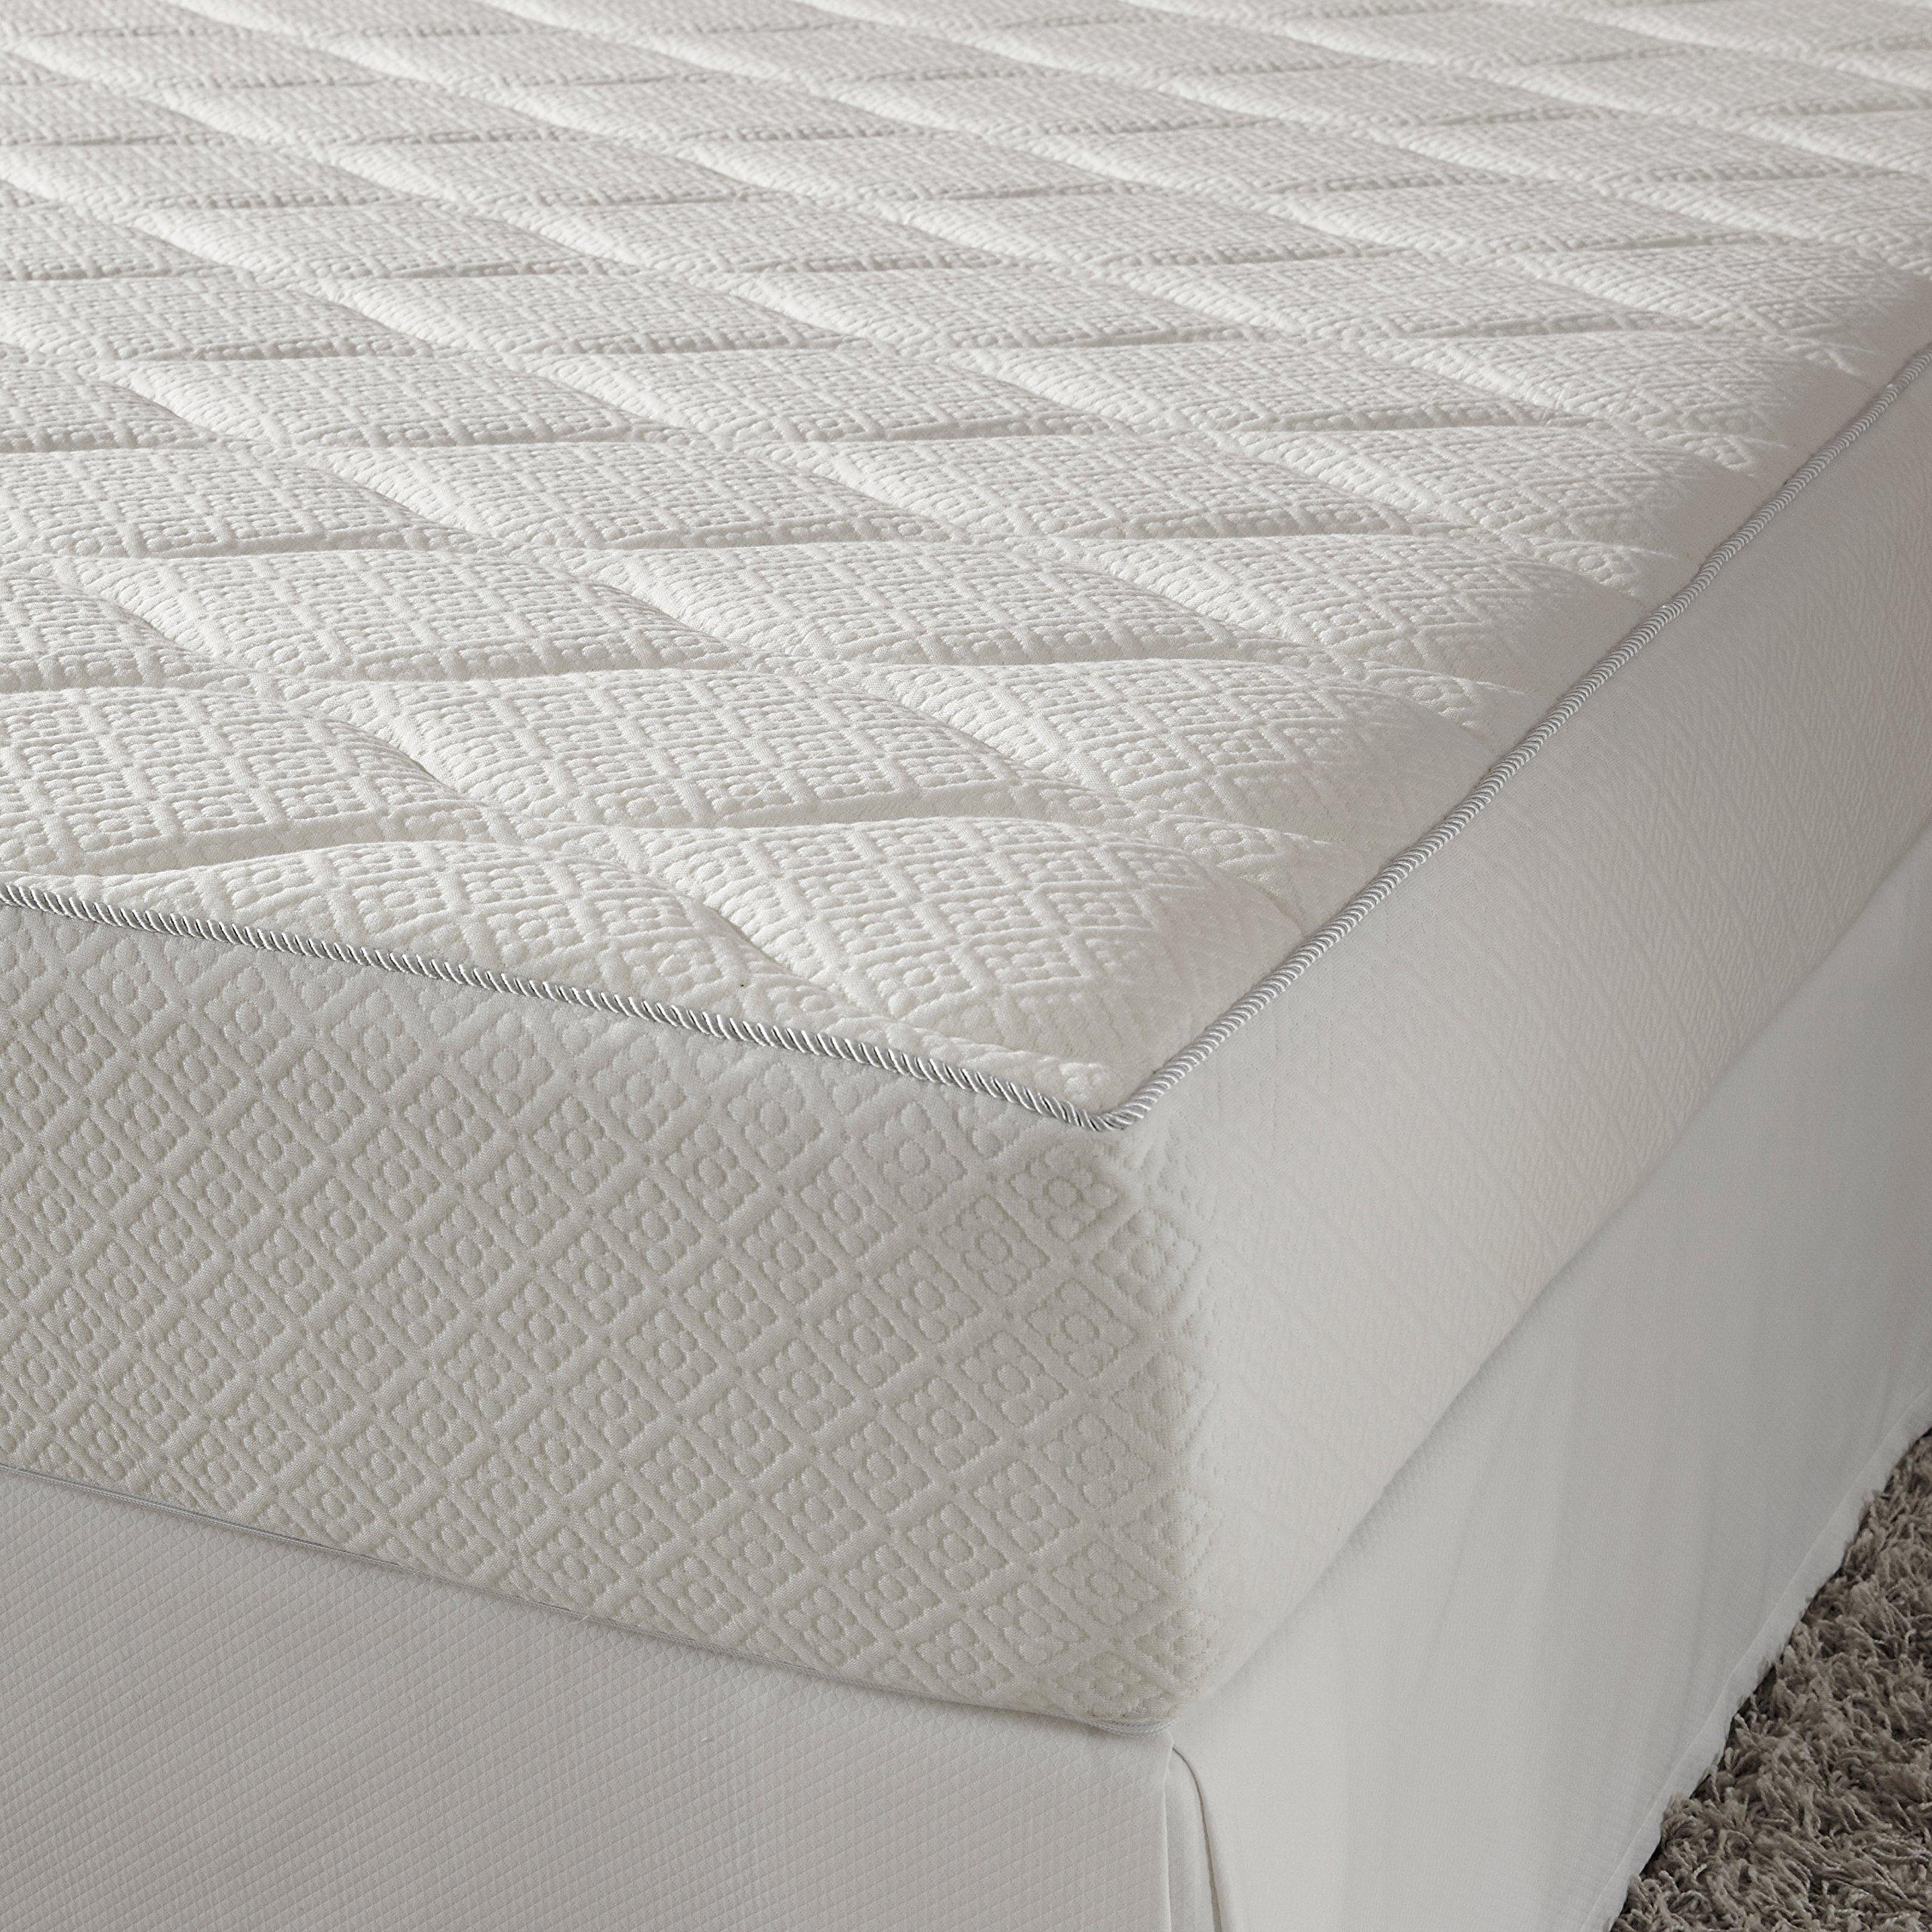 Pure Rest MFM-204-1T 10'' Medium Firm Memory Foam Mattress, Twin, White